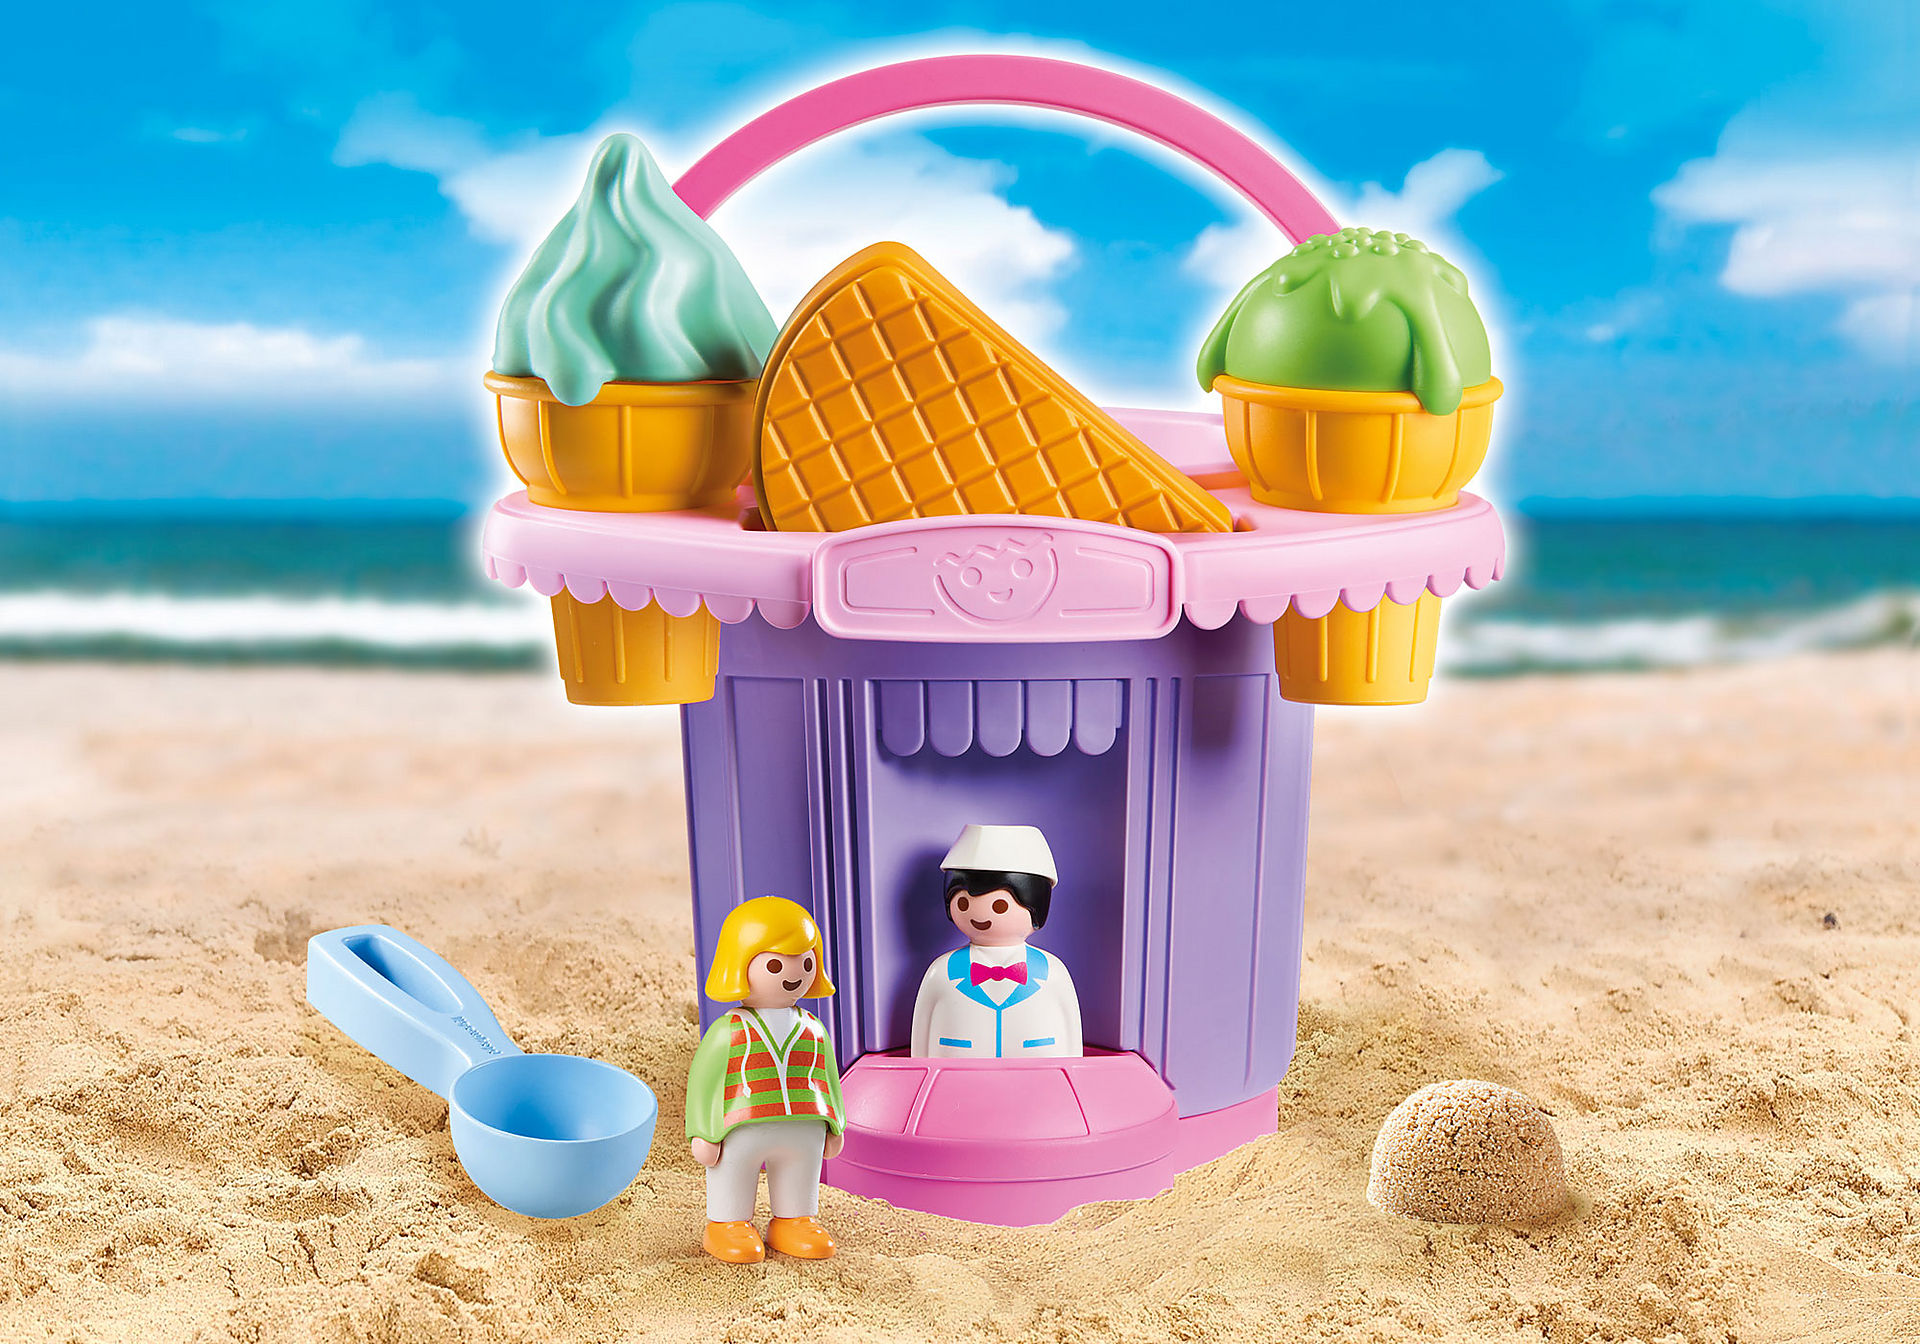 http://media.playmobil.com/i/playmobil/9406_product_detail/Ice Cream Shop Sand Bucket